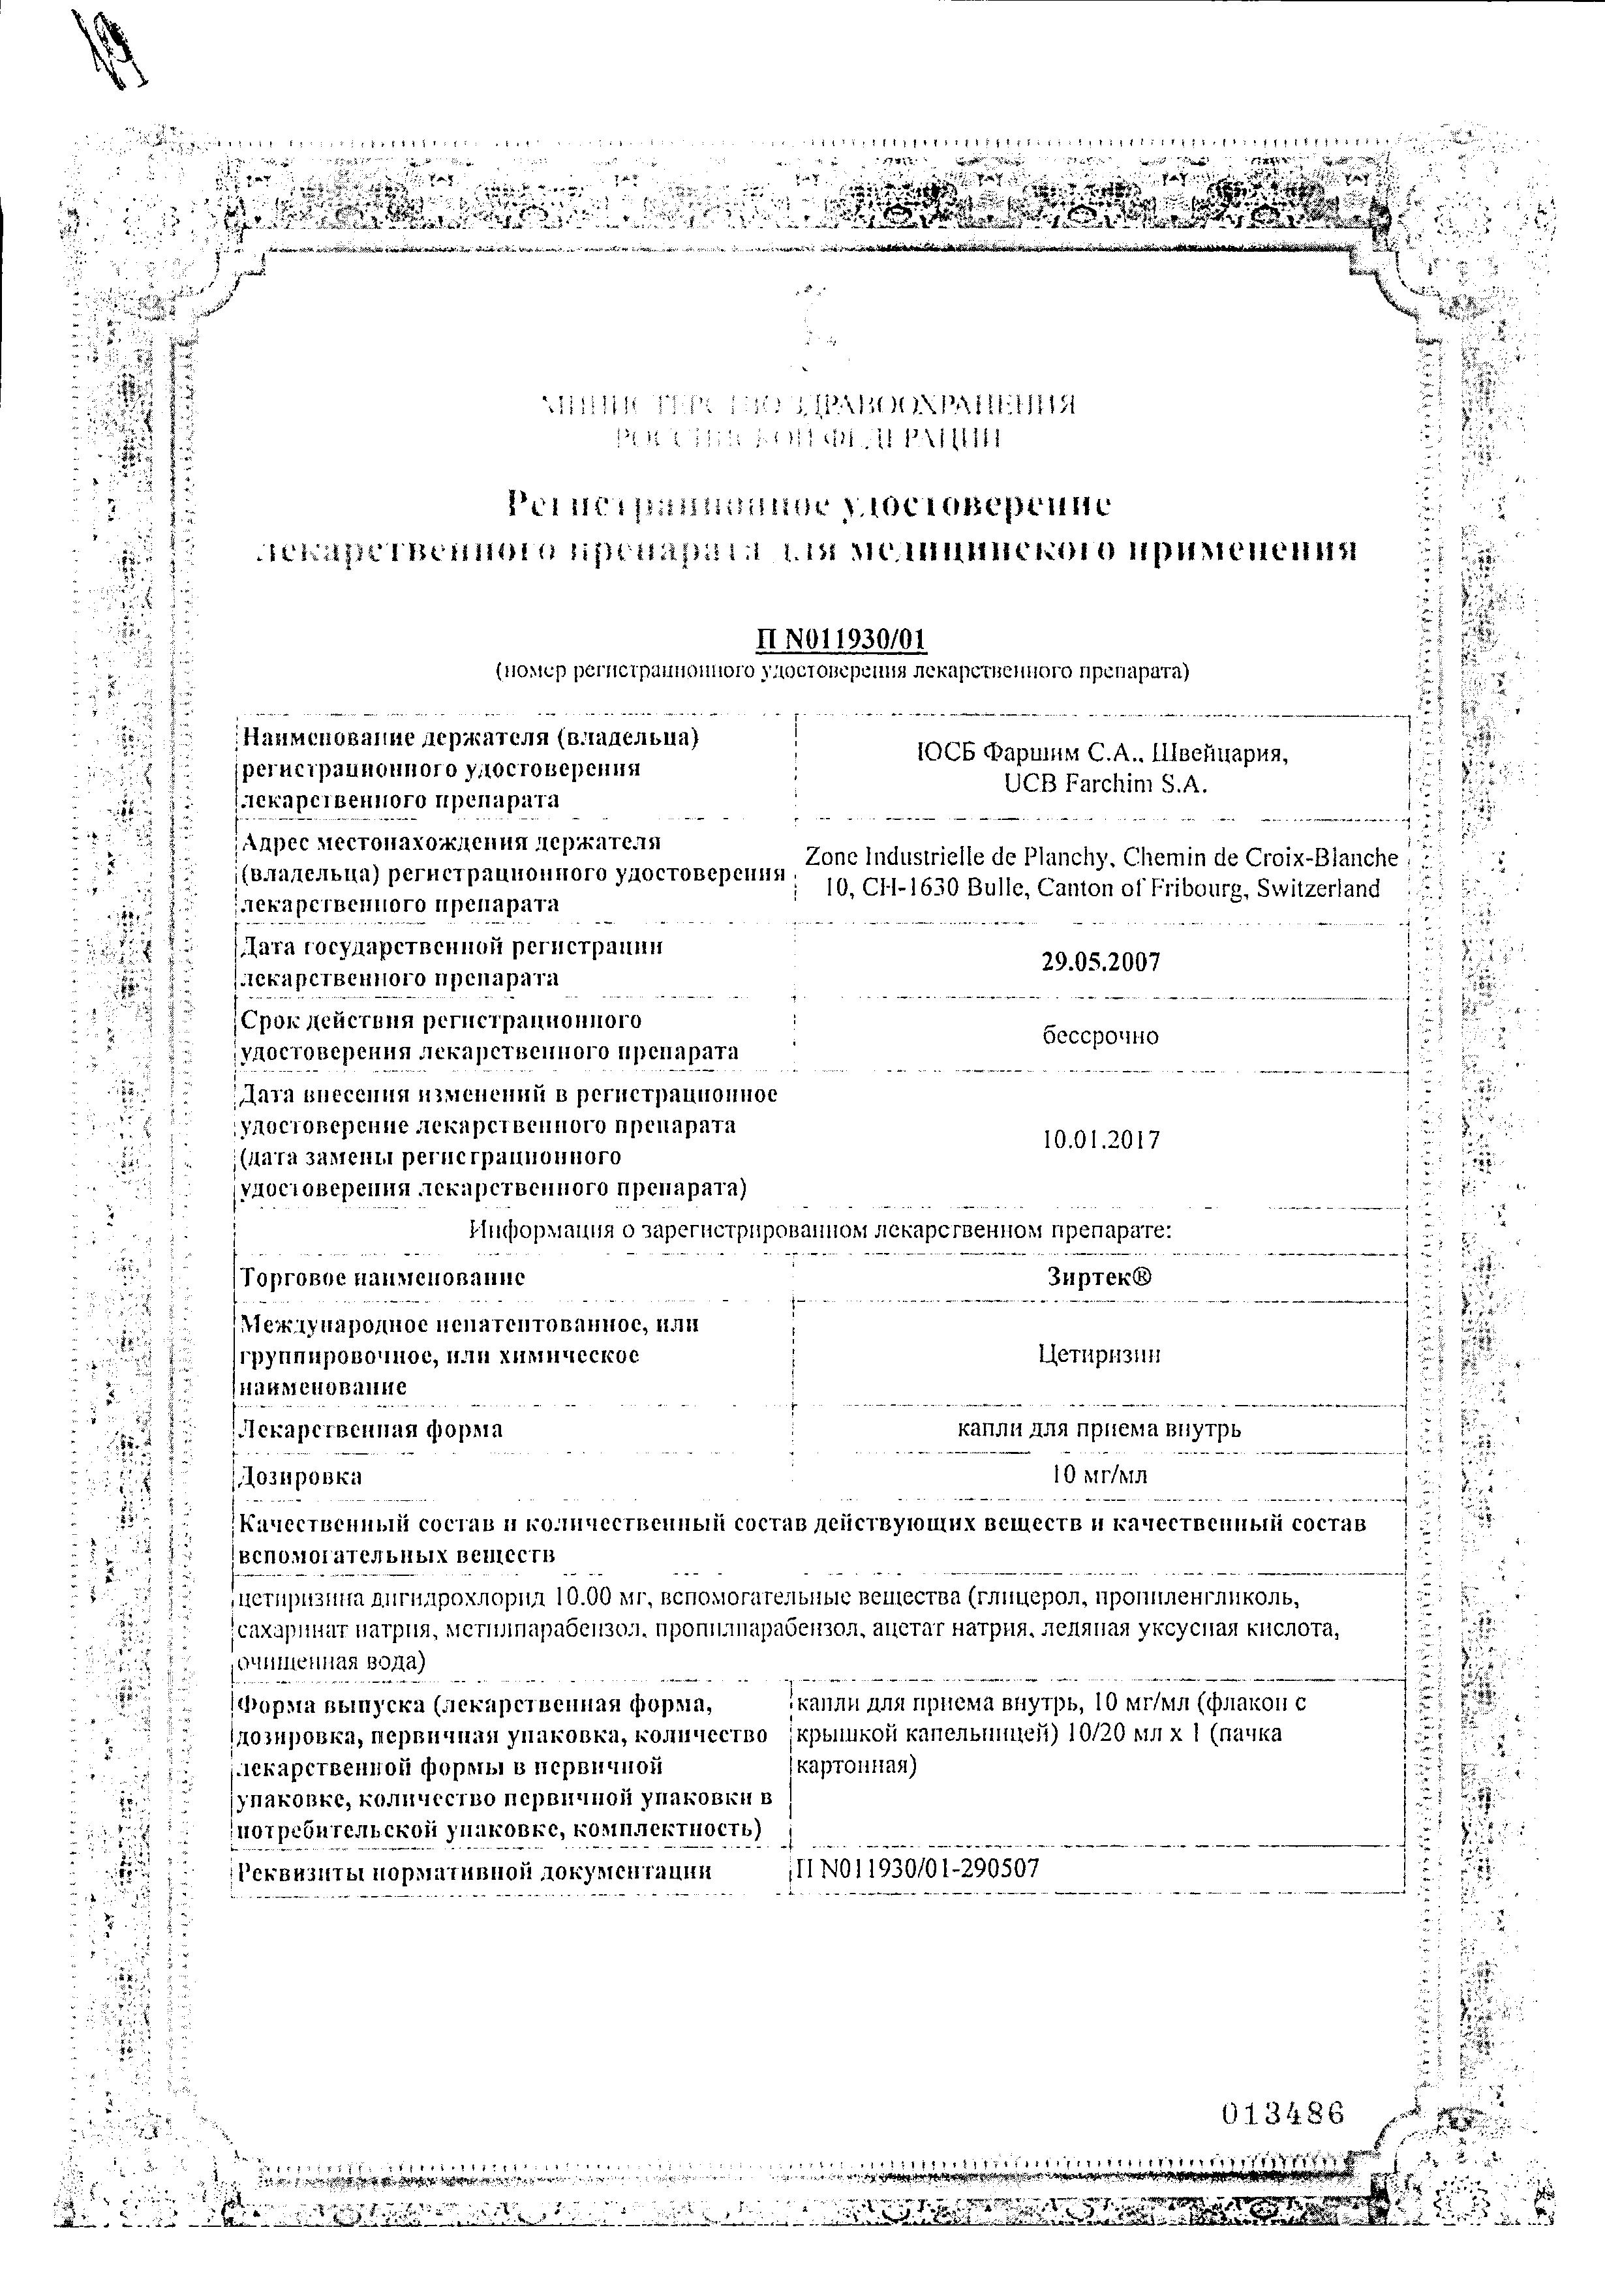 Зиртек сертификат